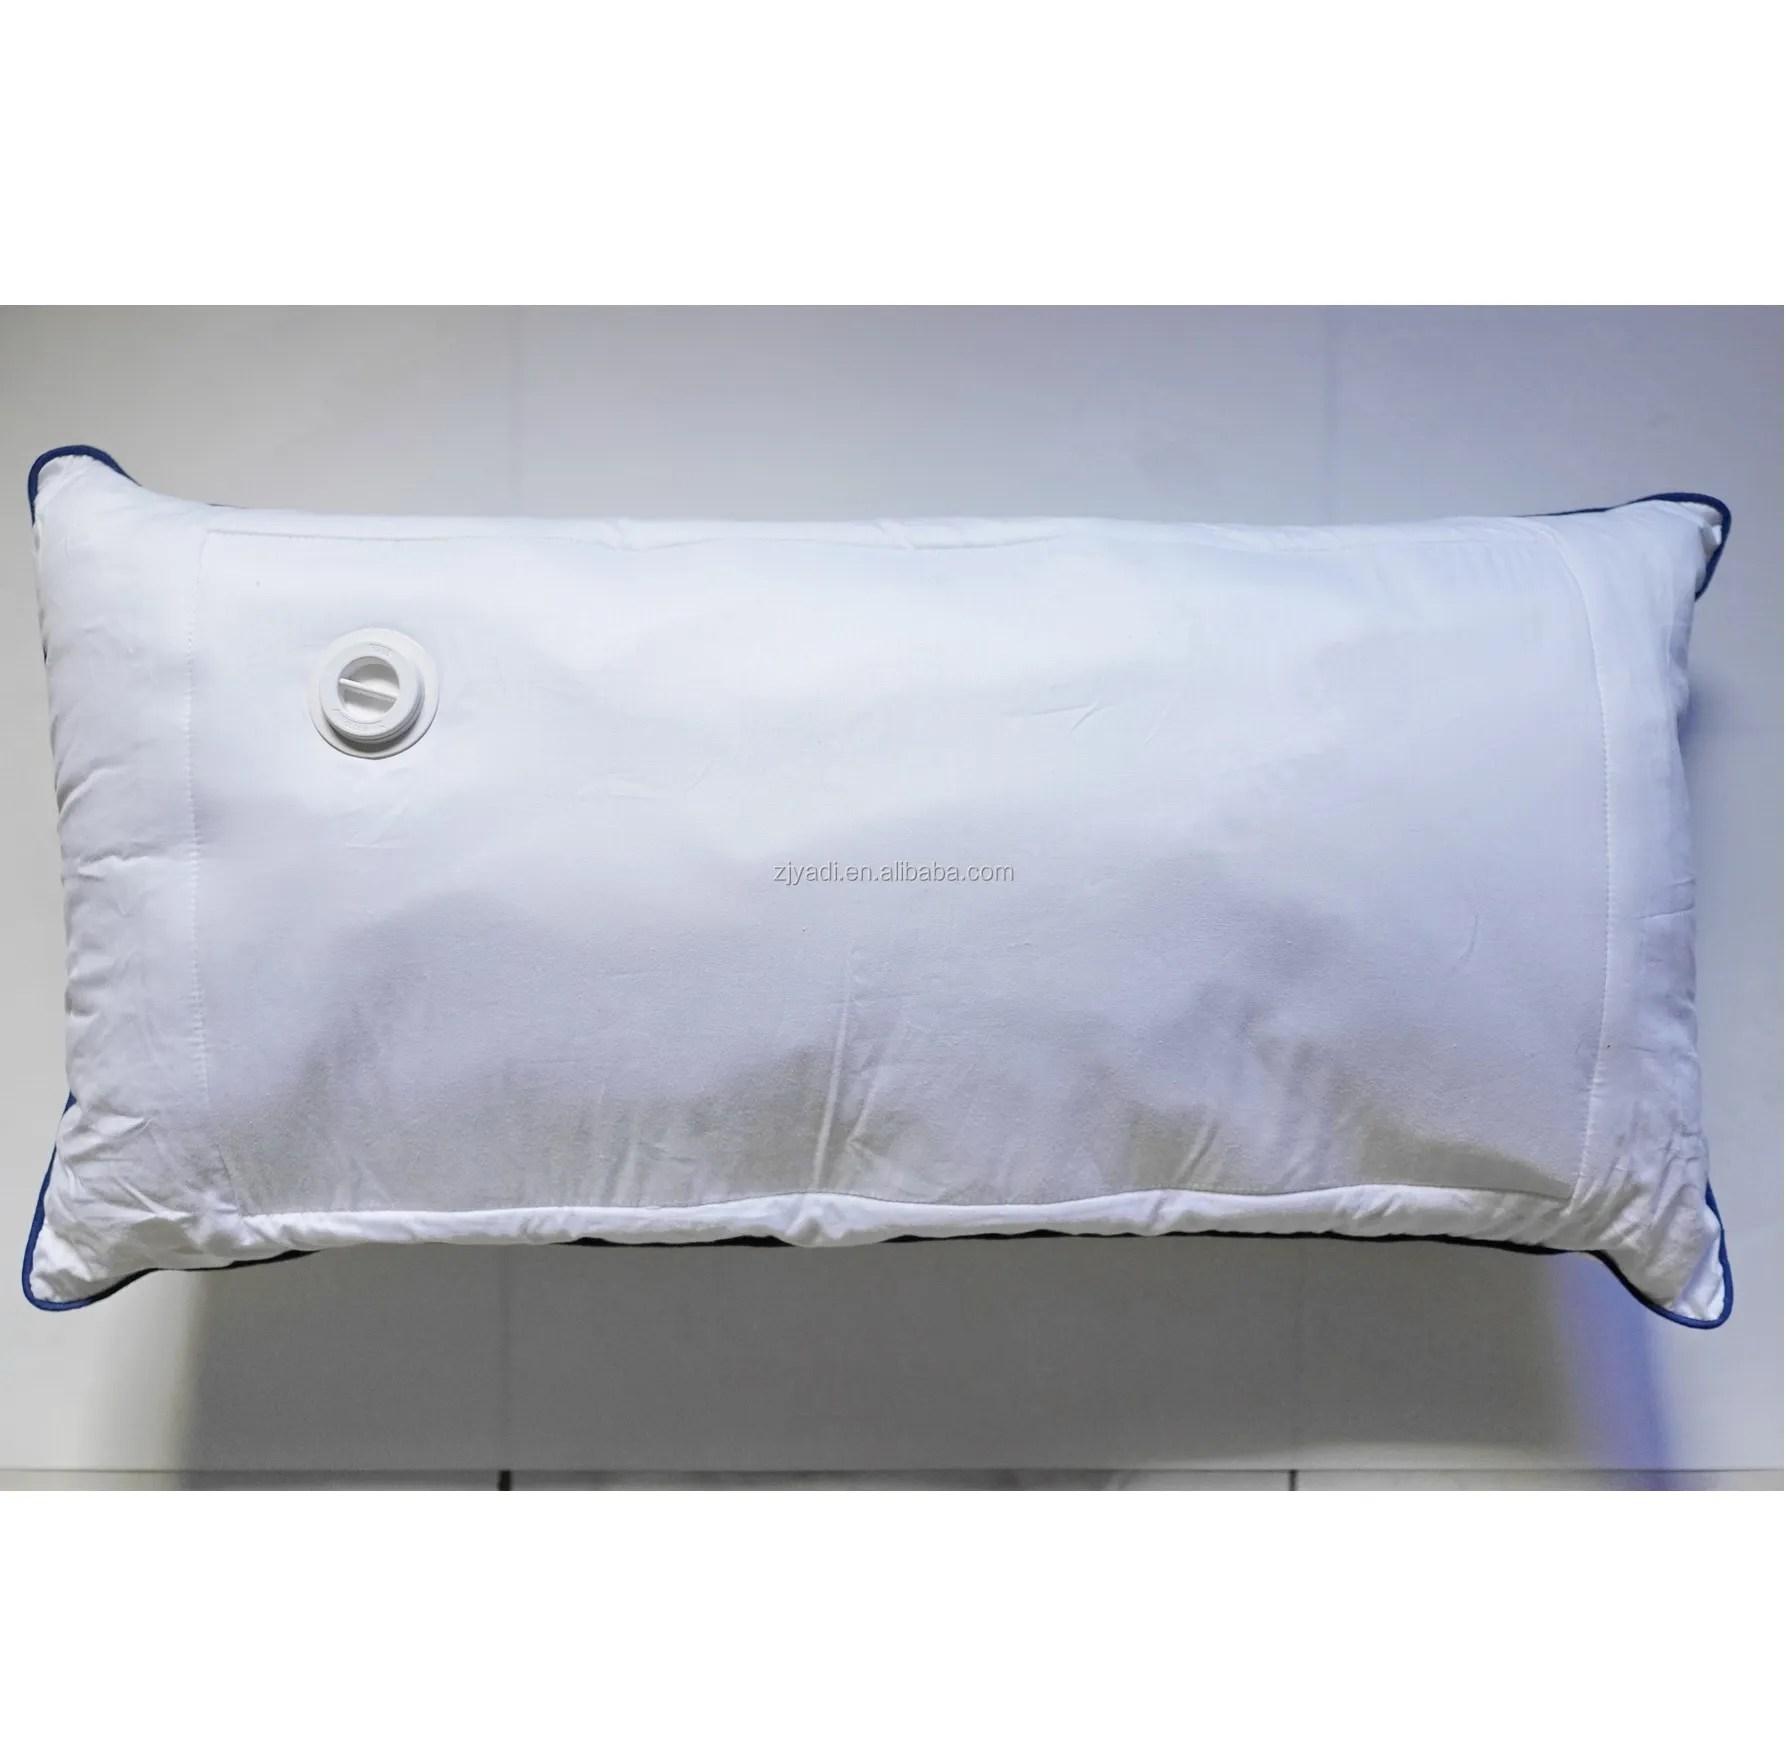 original cooling water pillow water base fiber fill pillow 80x40cm 70x50cm buy water pillow water base pillow cooling pillow product on alibaba com